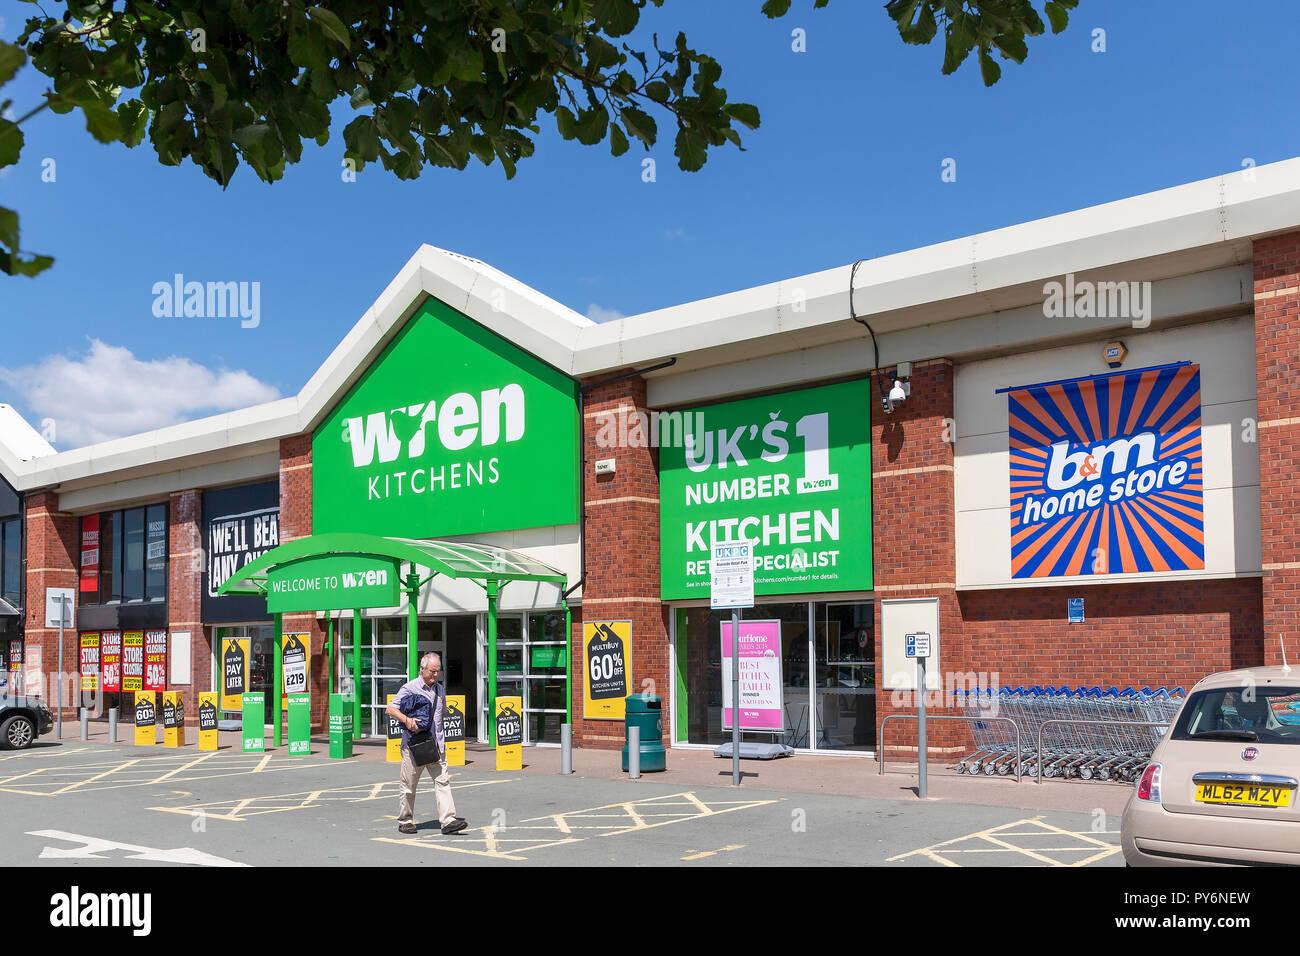 Warrington branch of Wren Kitchens on the Riverside Retail Park - Stock Image